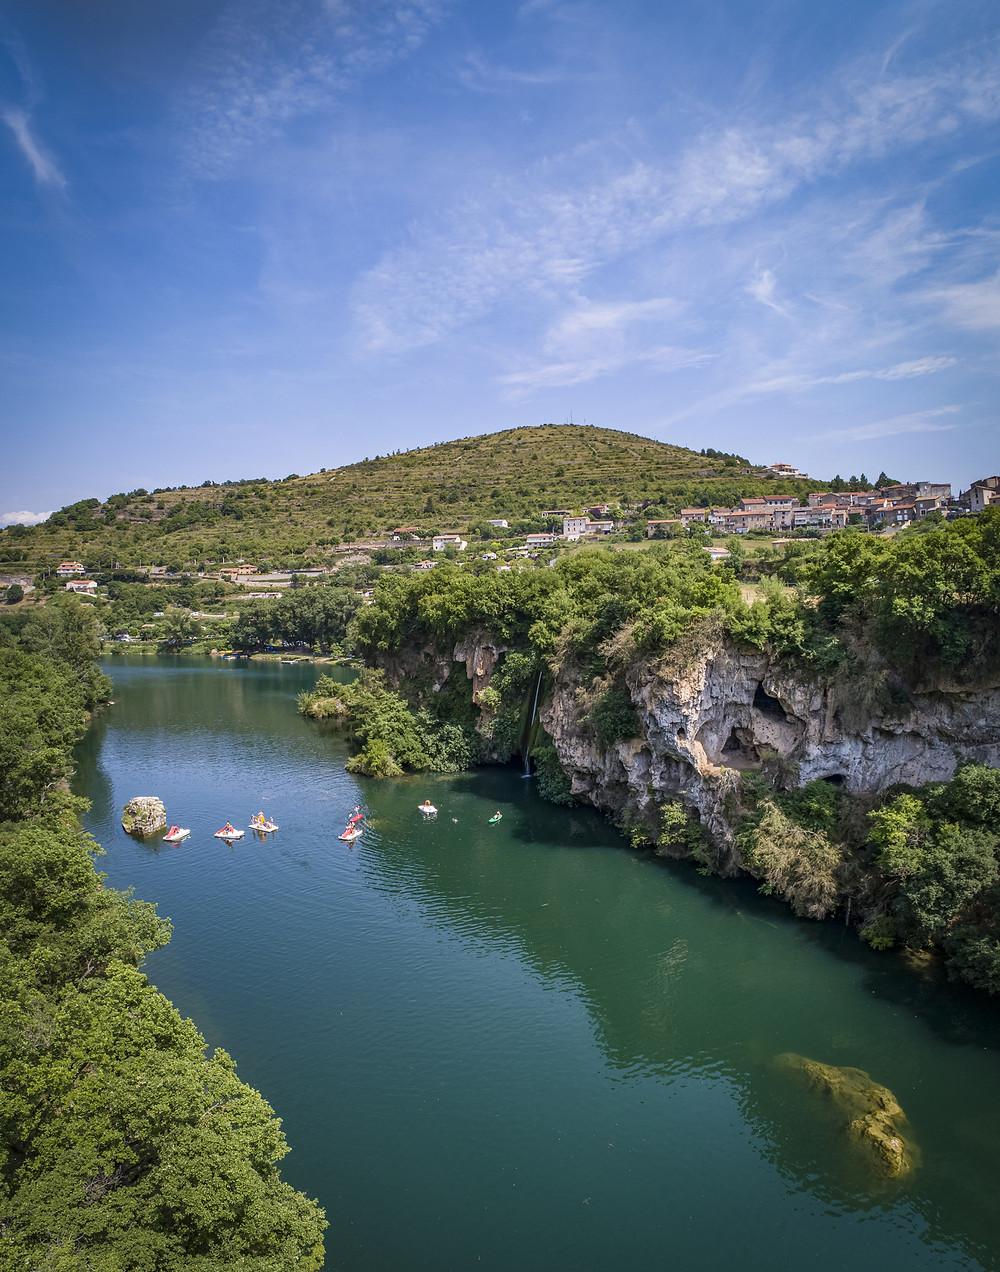 rivière-tarn-cascade-canoë-aveyron